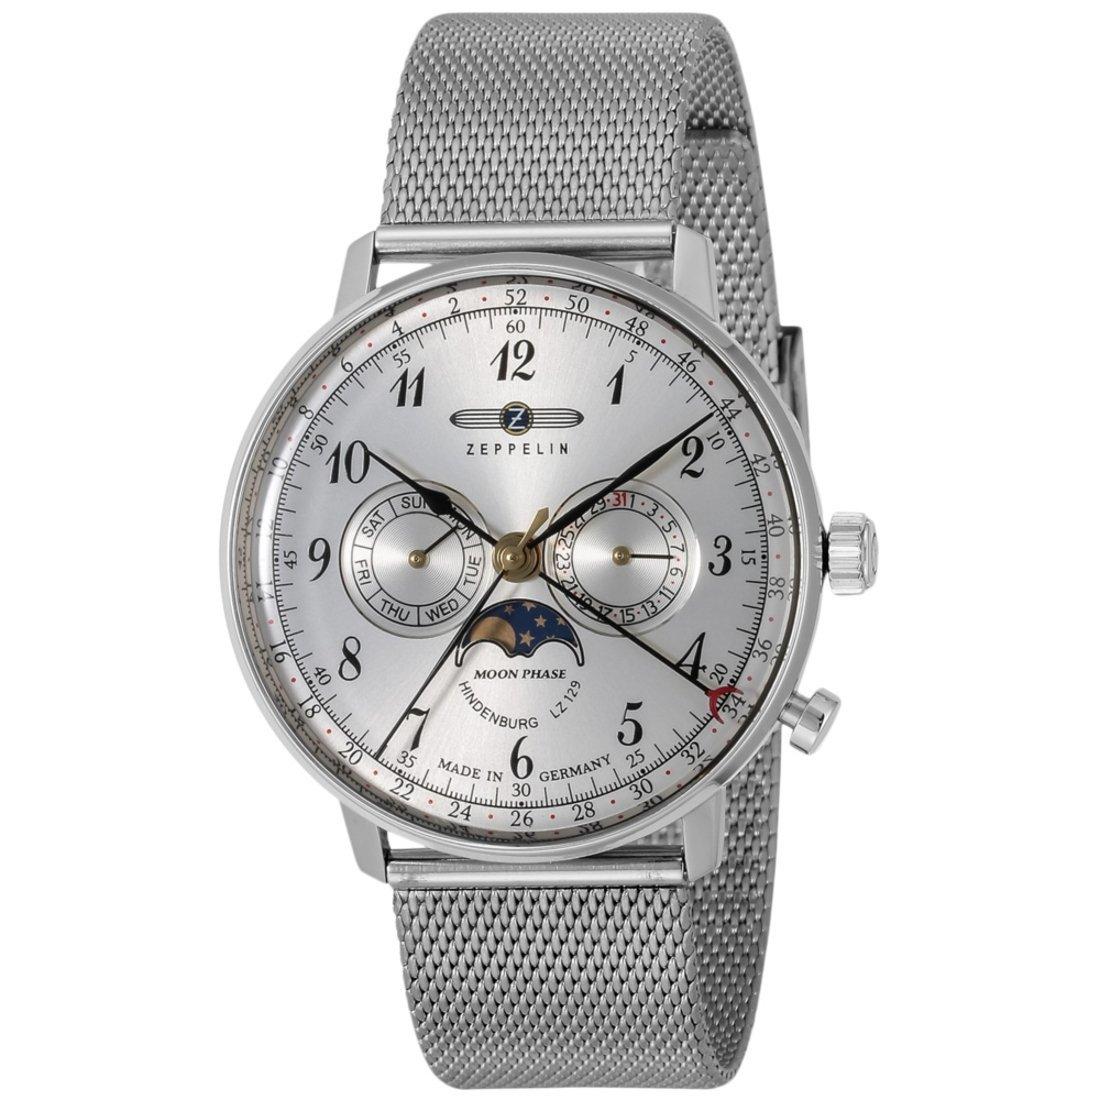 ZEPPELIN ツェッペリン ヒンデンブルク クオーツ メンズ 腕時計 7036M-1 シルバー 腕時計 贈り物 プレゼント